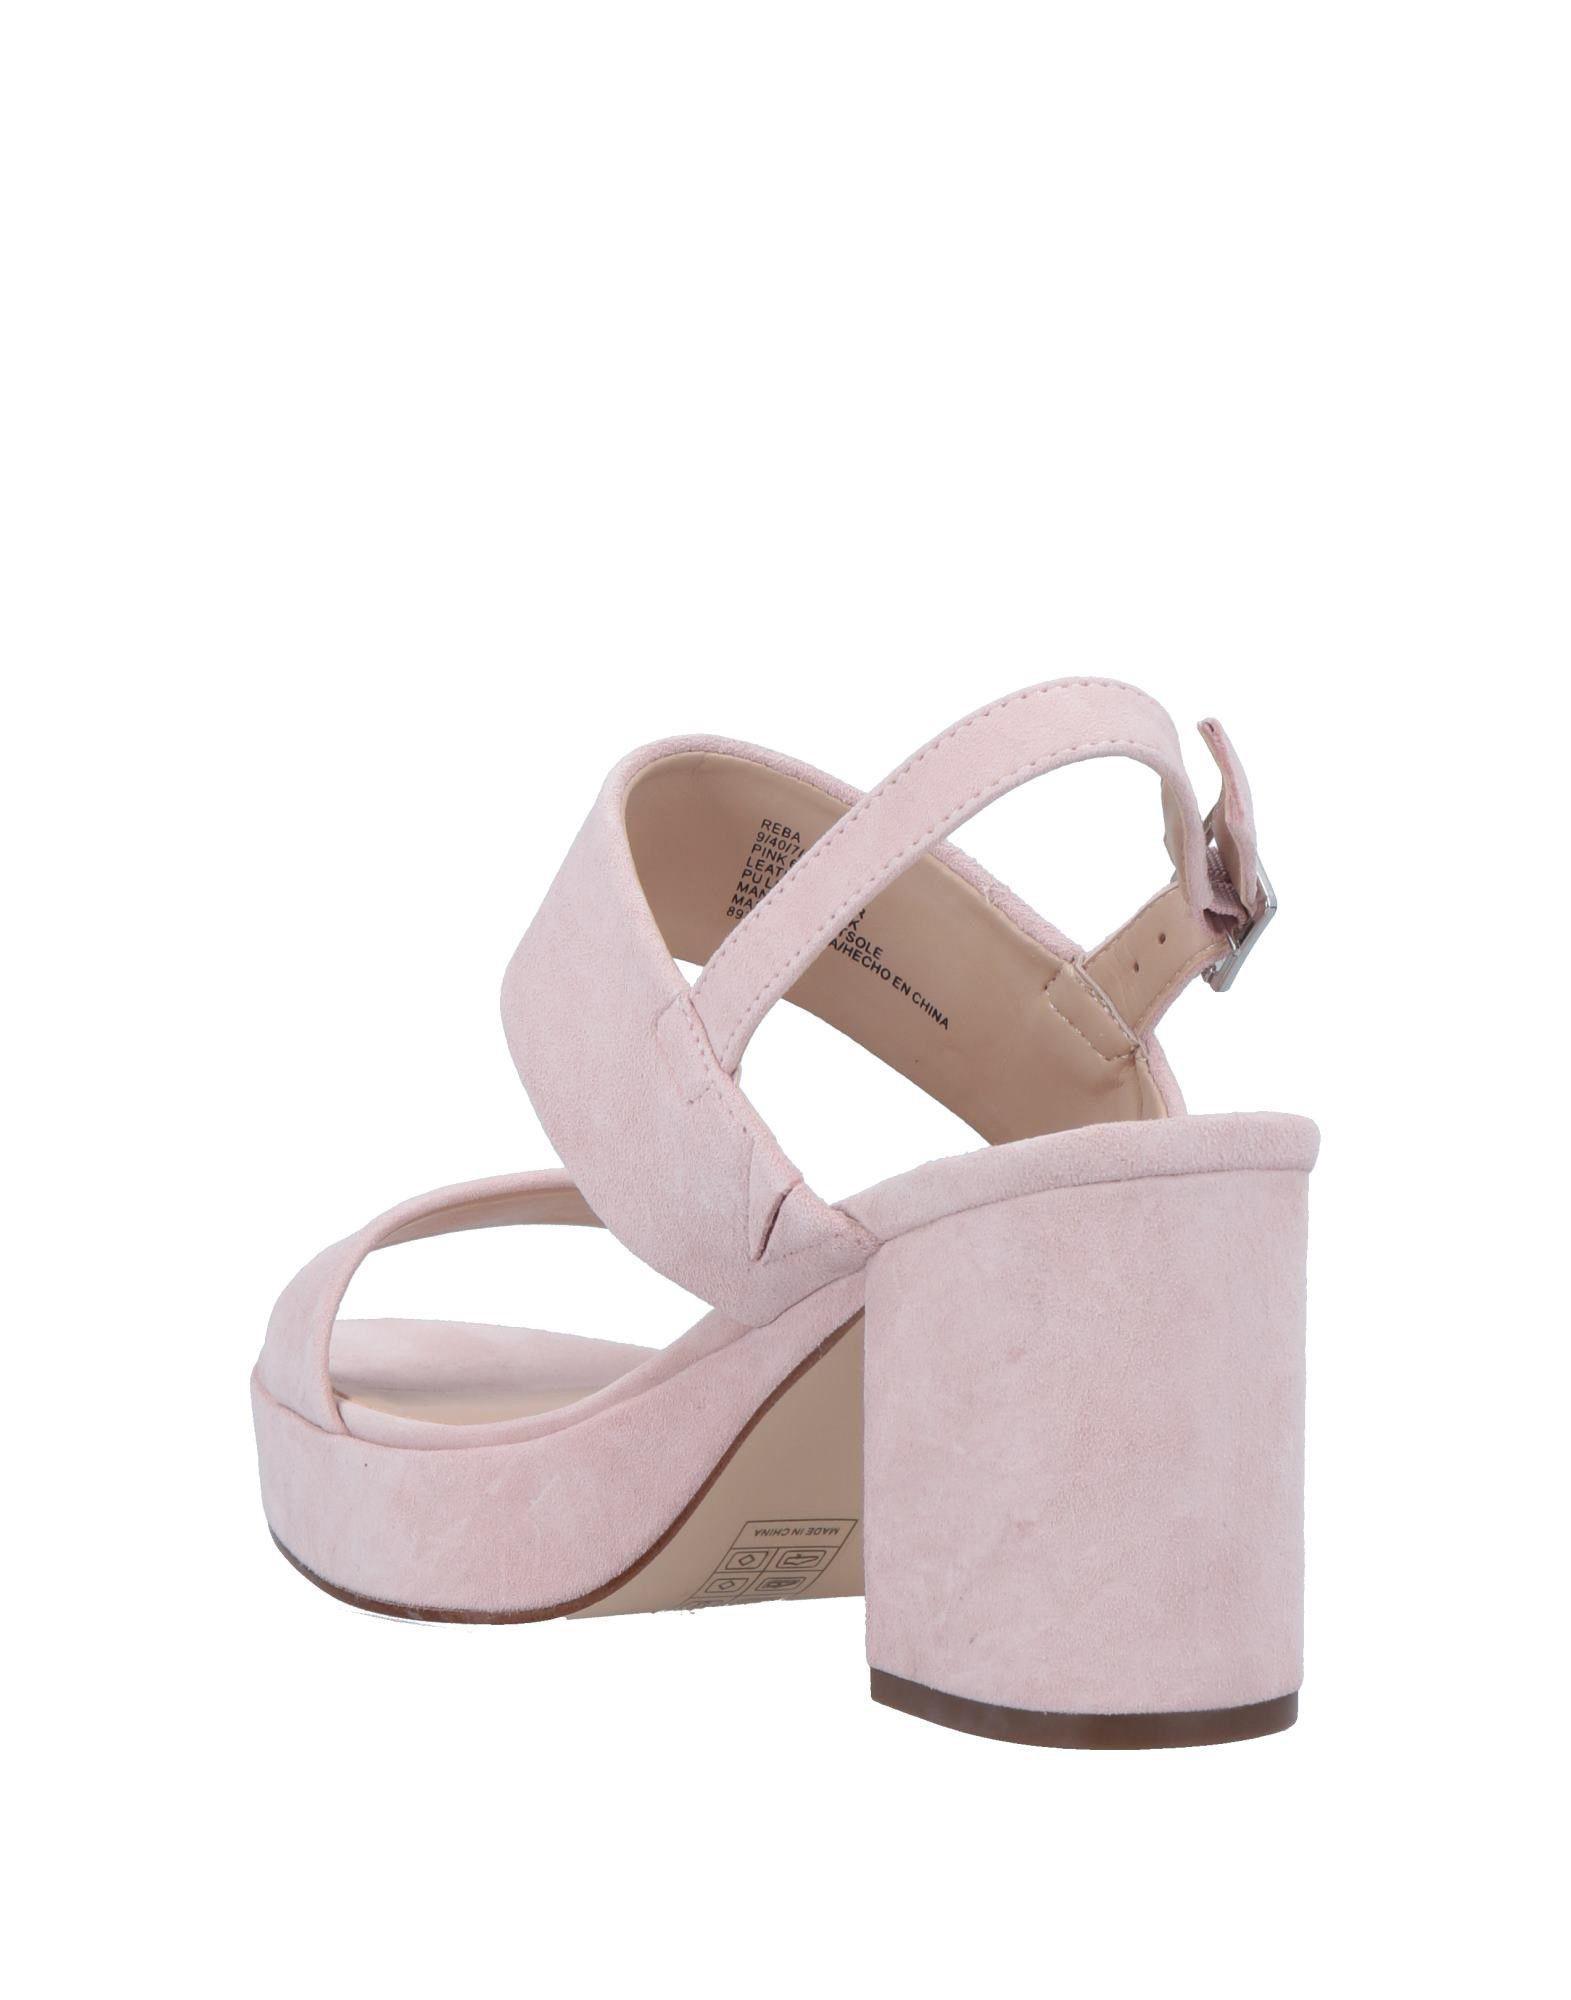 a40cb48b60a Lyst - Steve Madden Sandals in Pink